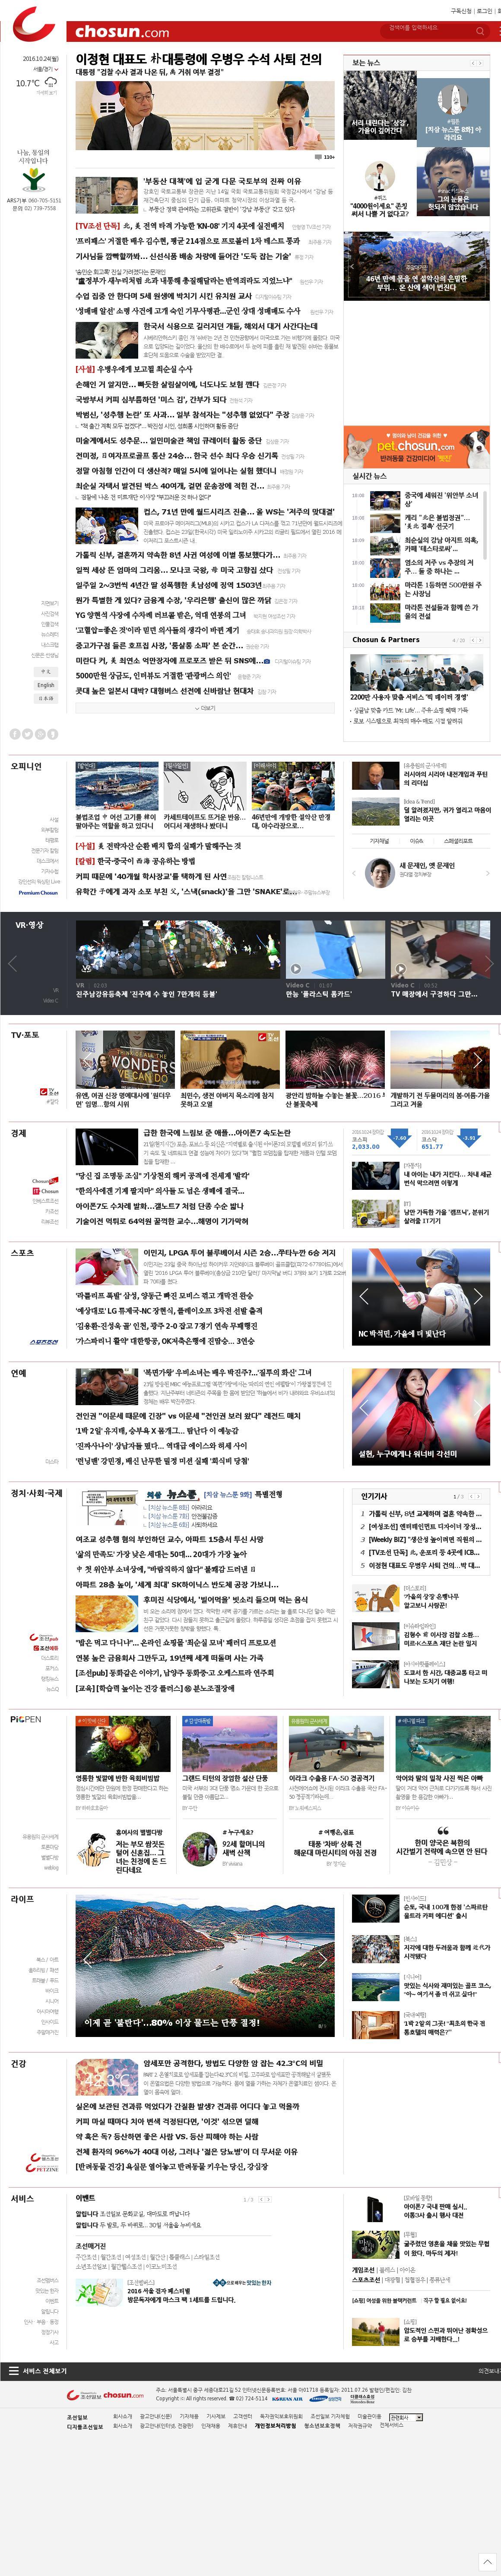 chosun.com at Sunday Oct. 23, 2016, 7:01 p.m. UTC